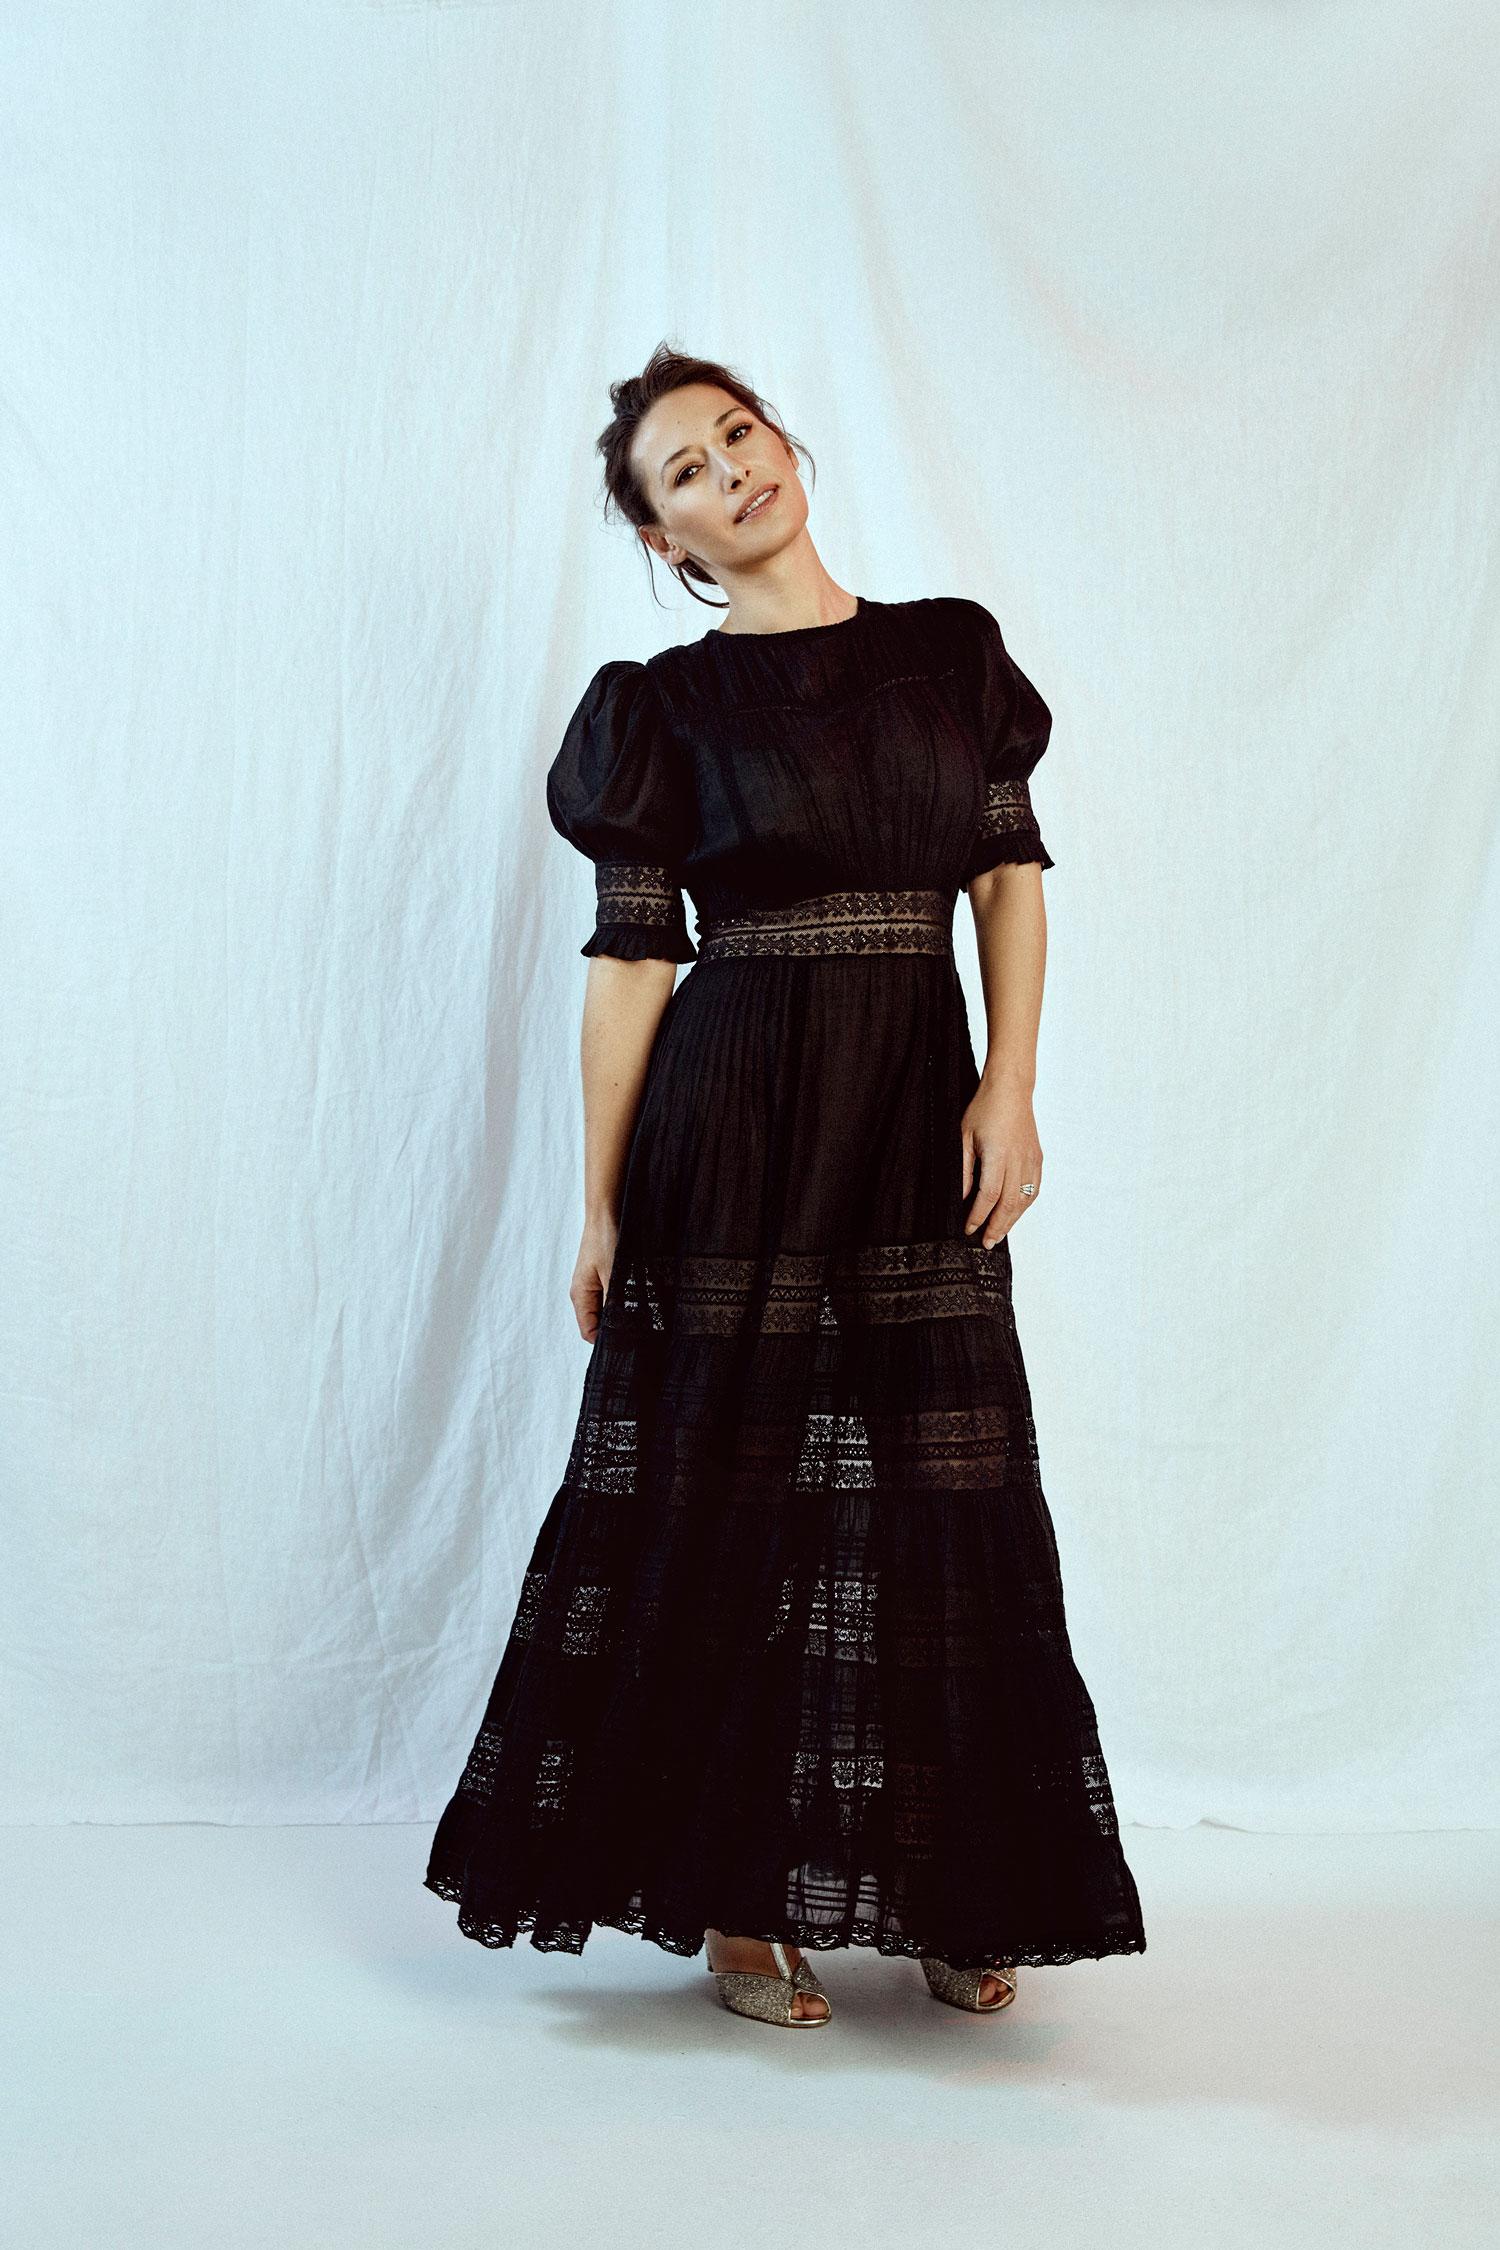 Pia-Tjelta-SS19_Mio-Dress-Black_-NOK4200.jpg